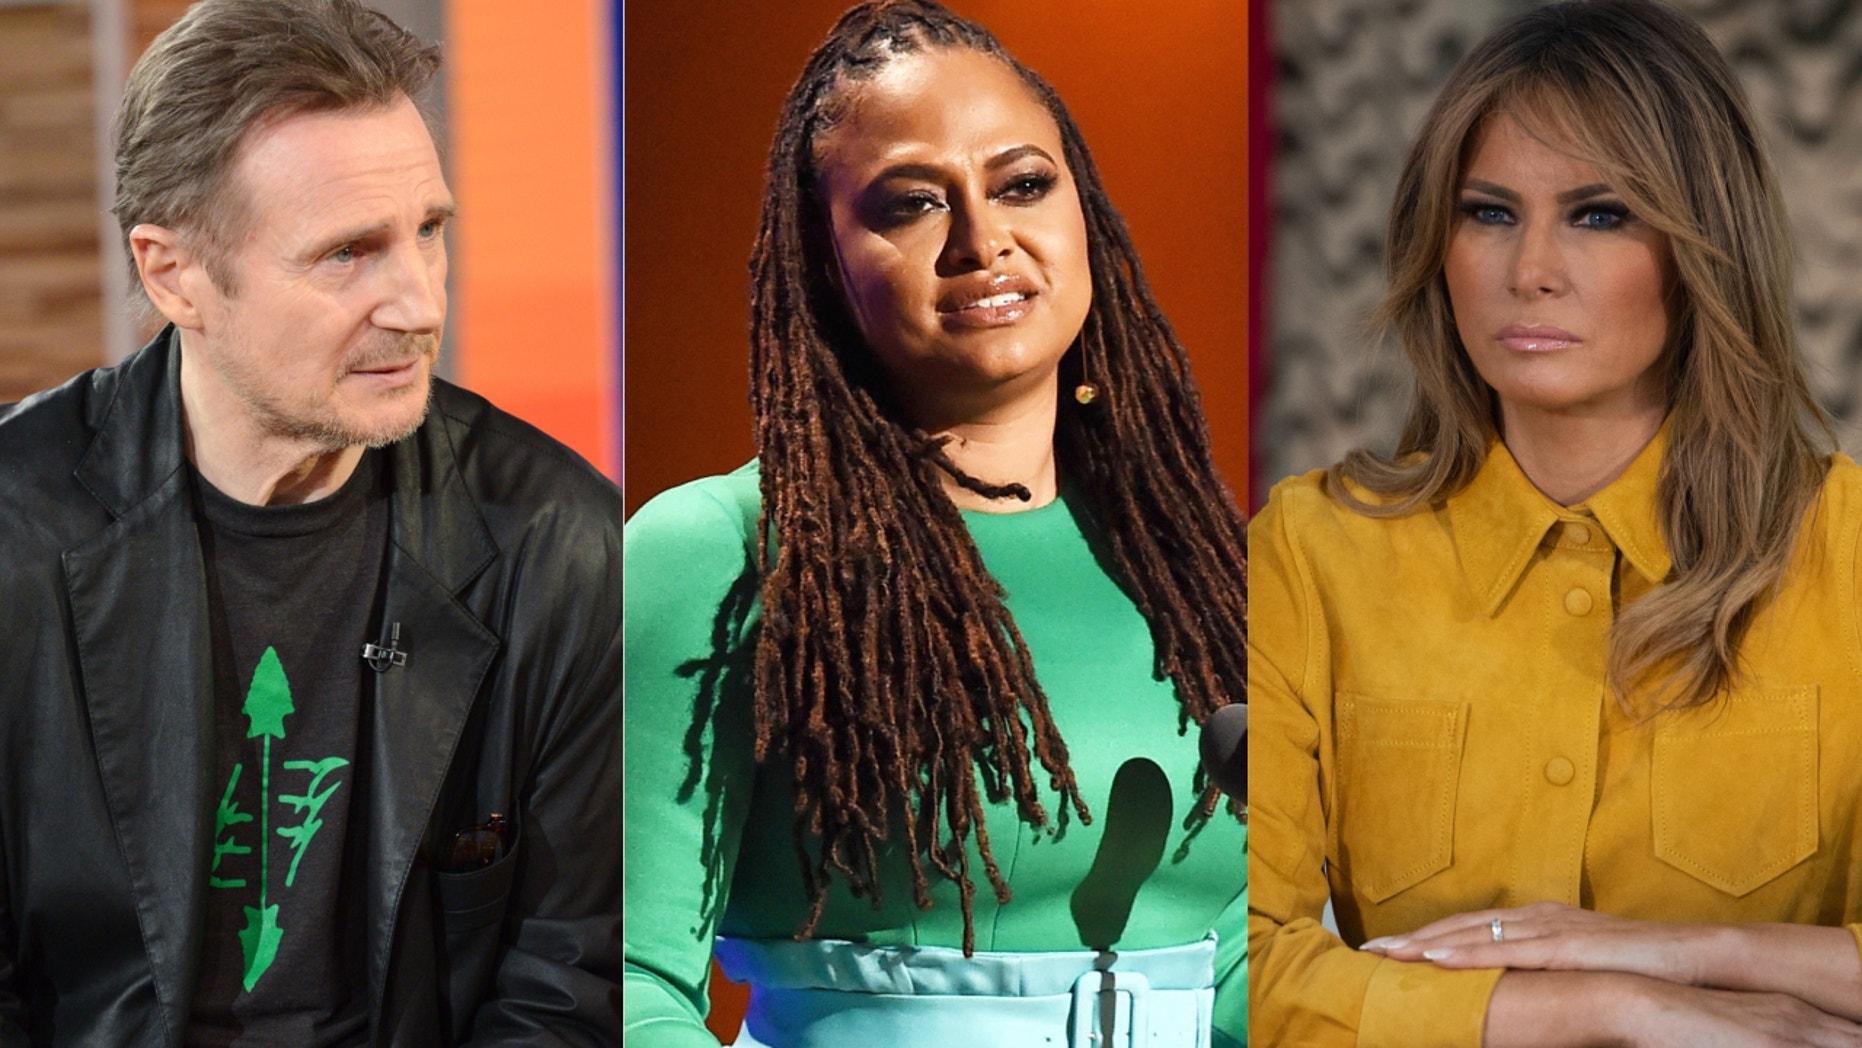 Liam Neeson, Ava DuVernay and Melania Trump